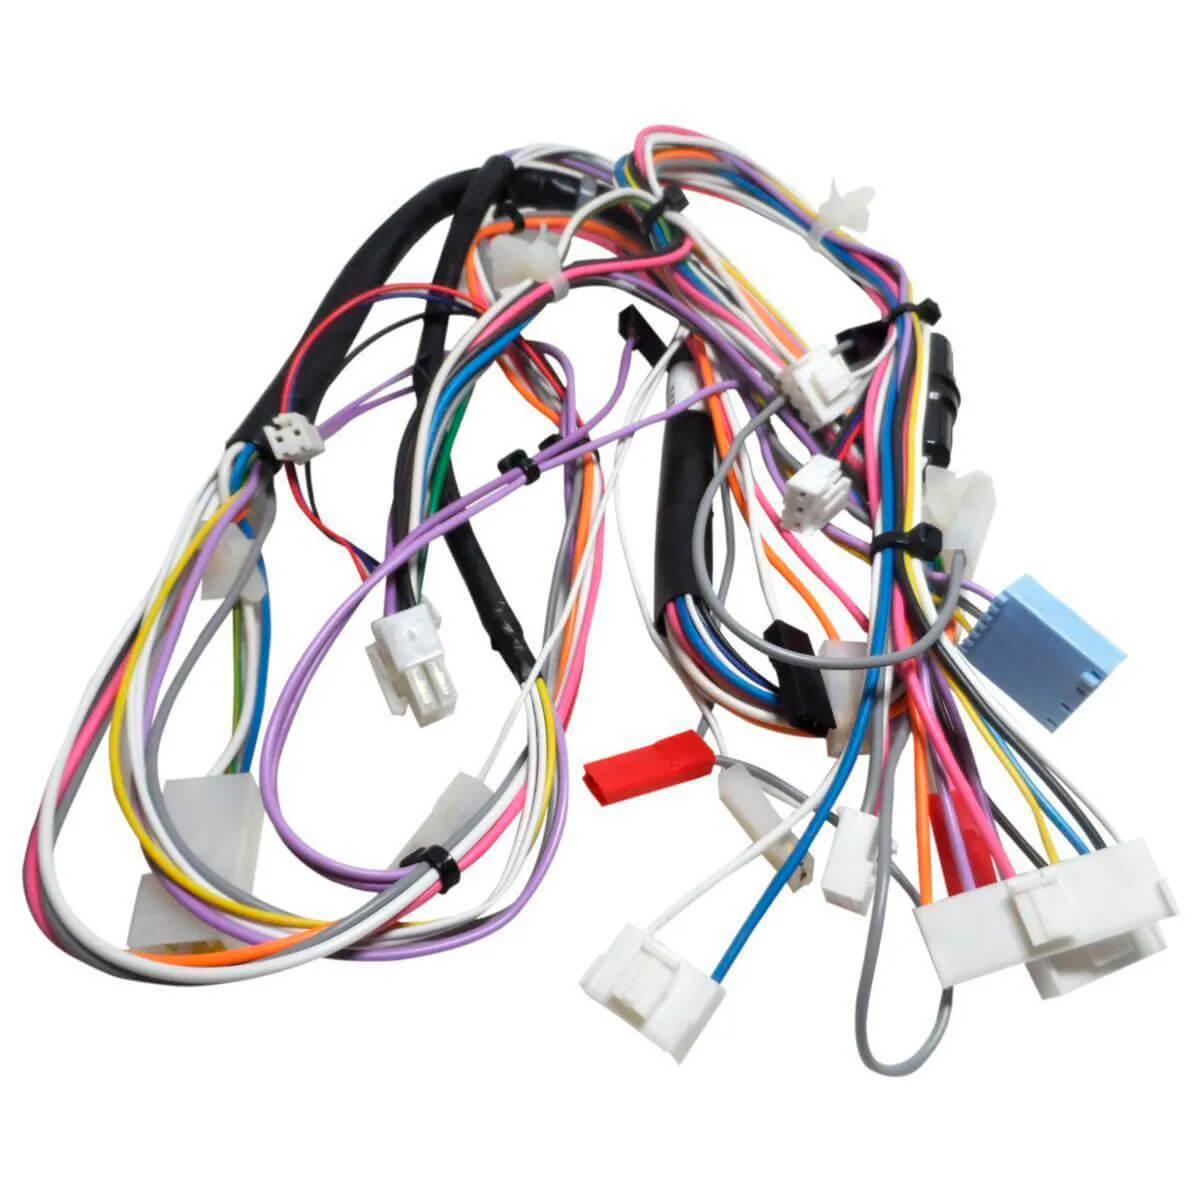 Rede Elétrica Superior Para Lavadora De Roupas 15KG Electrolux LTA15  - 64591667